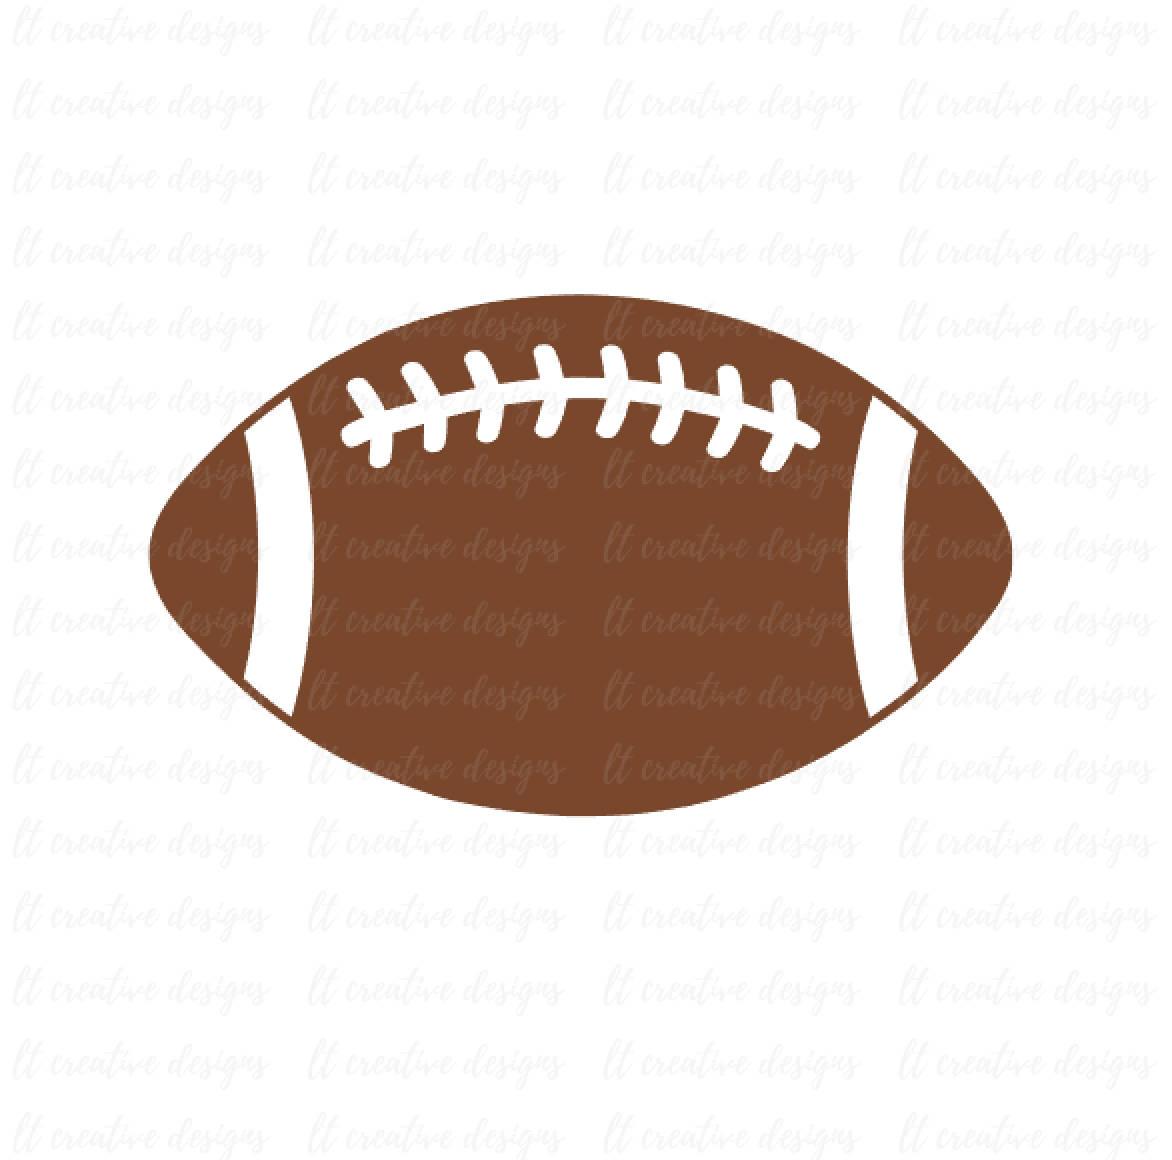 1172x1160 Football Svg Football Silhouette Football Png Football Cut